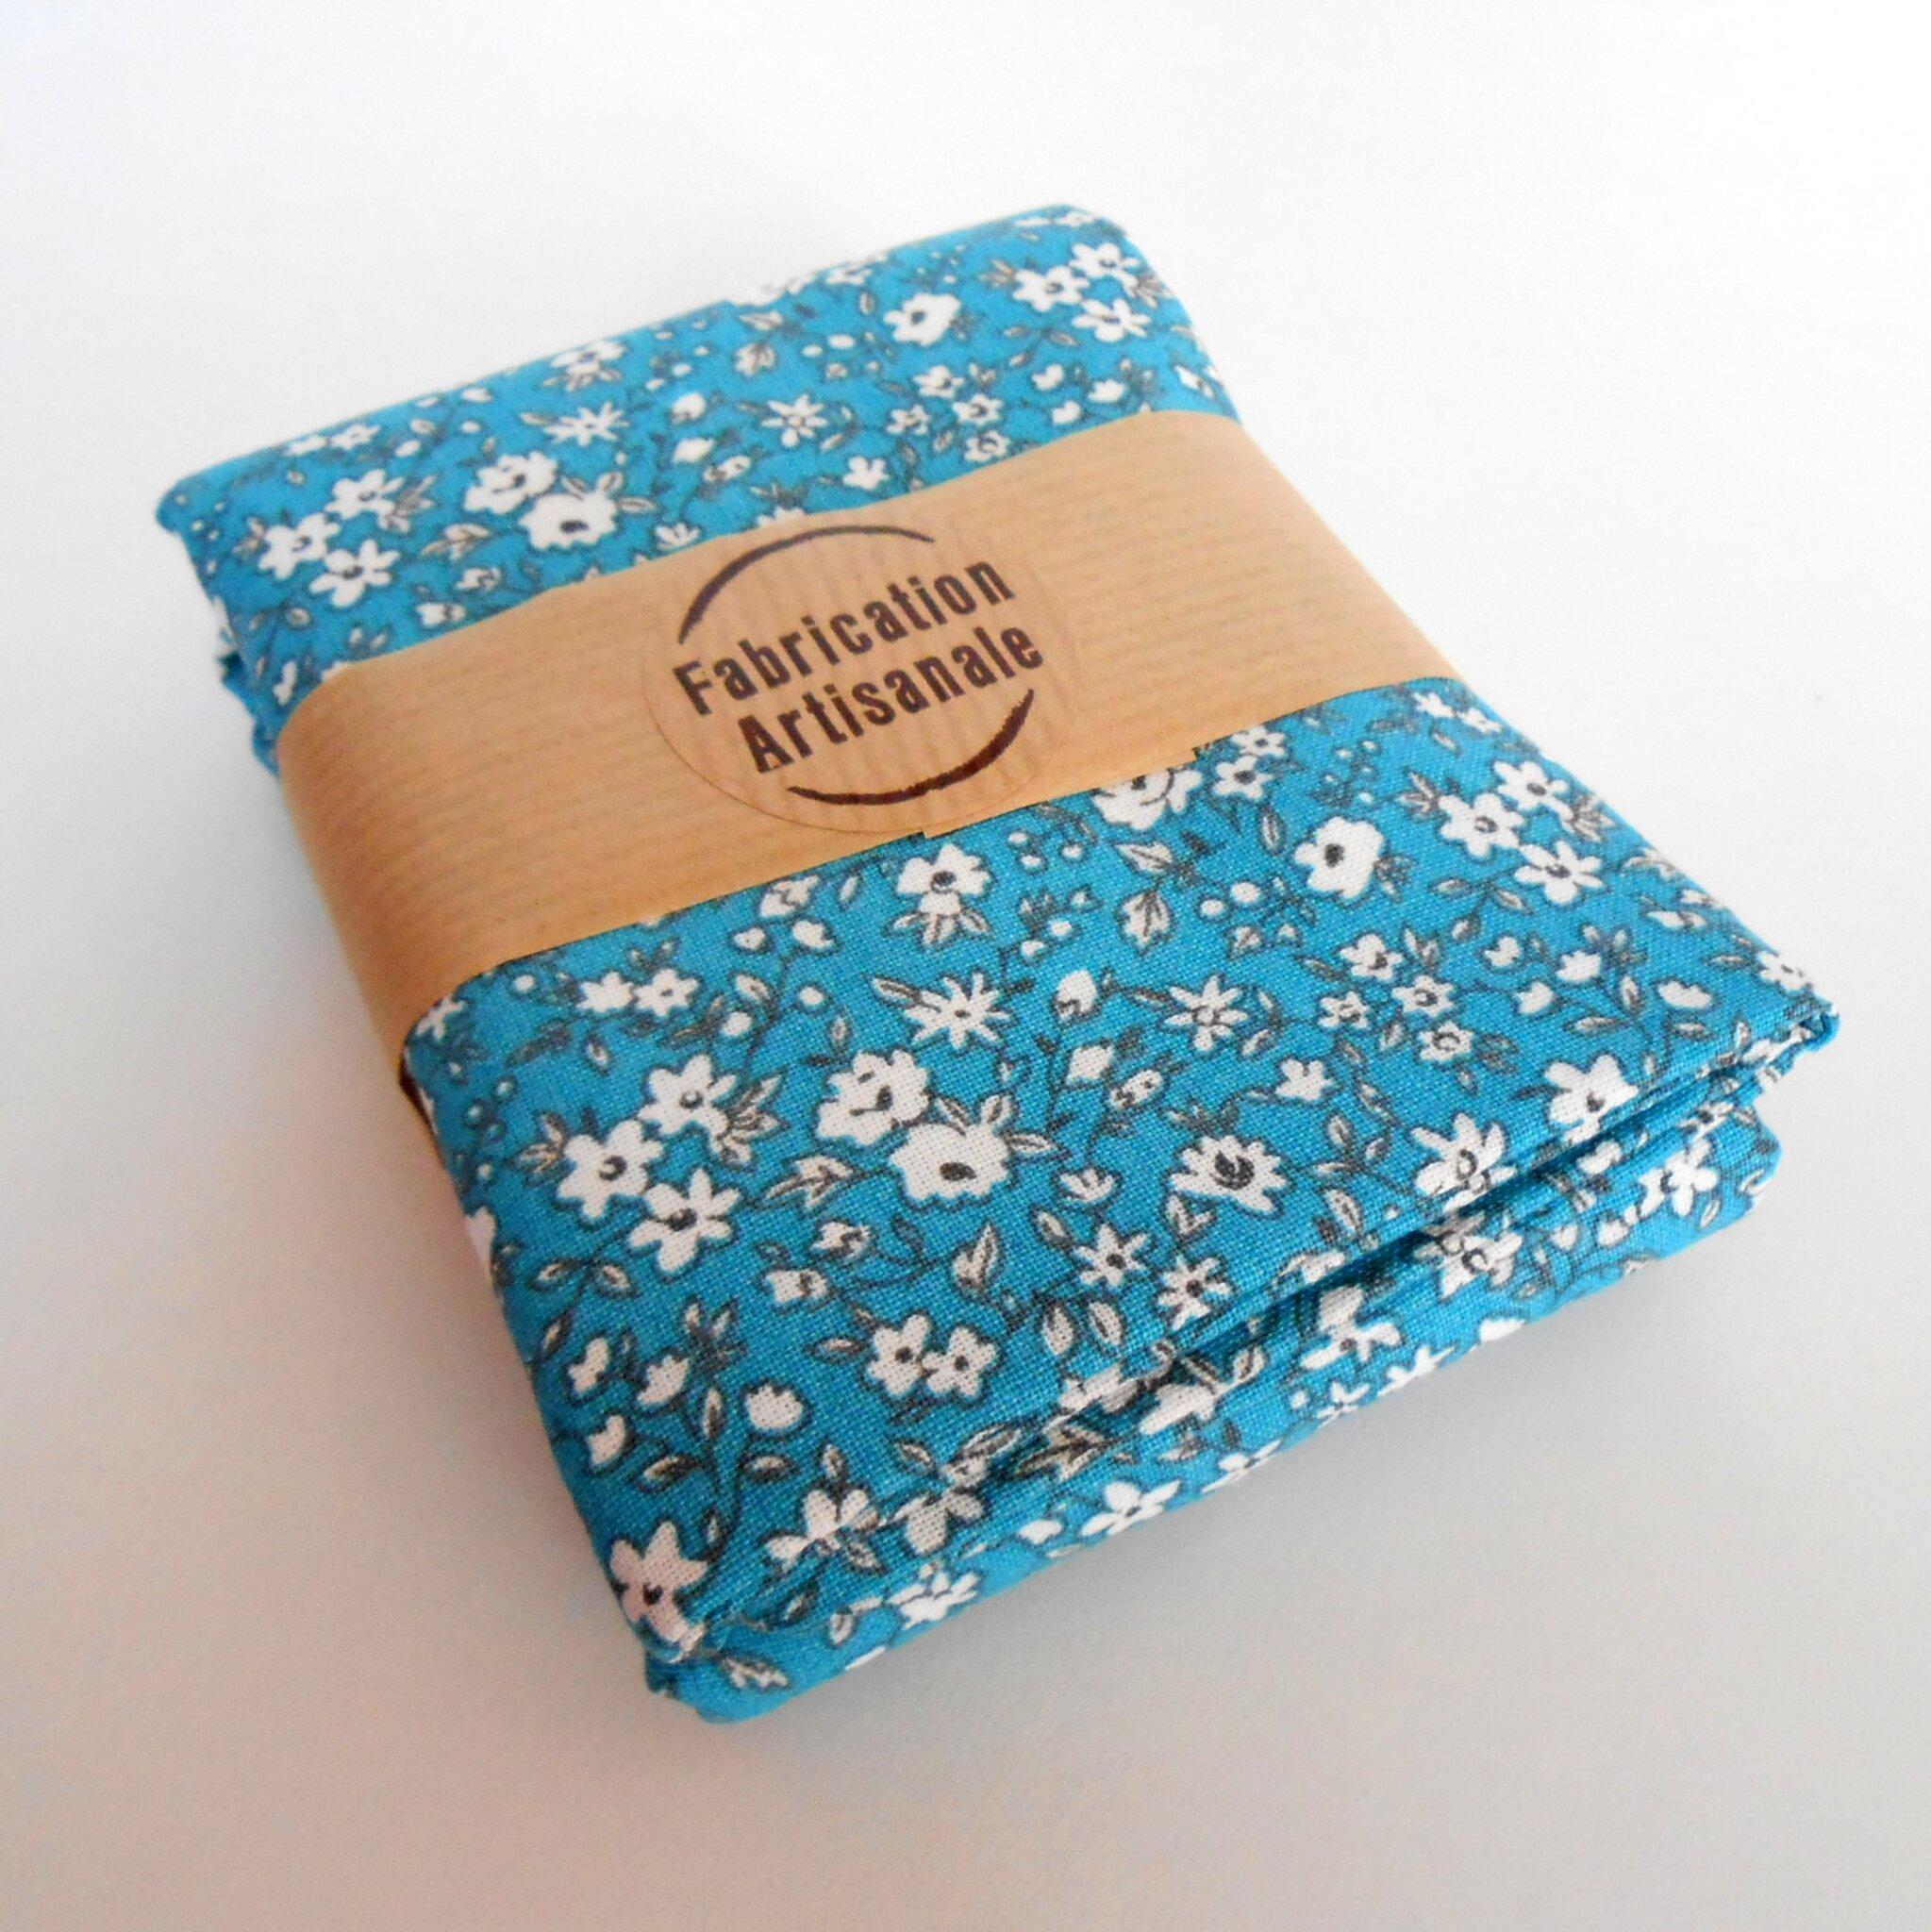 tote bag clocréations-fleurettes fond bleu3